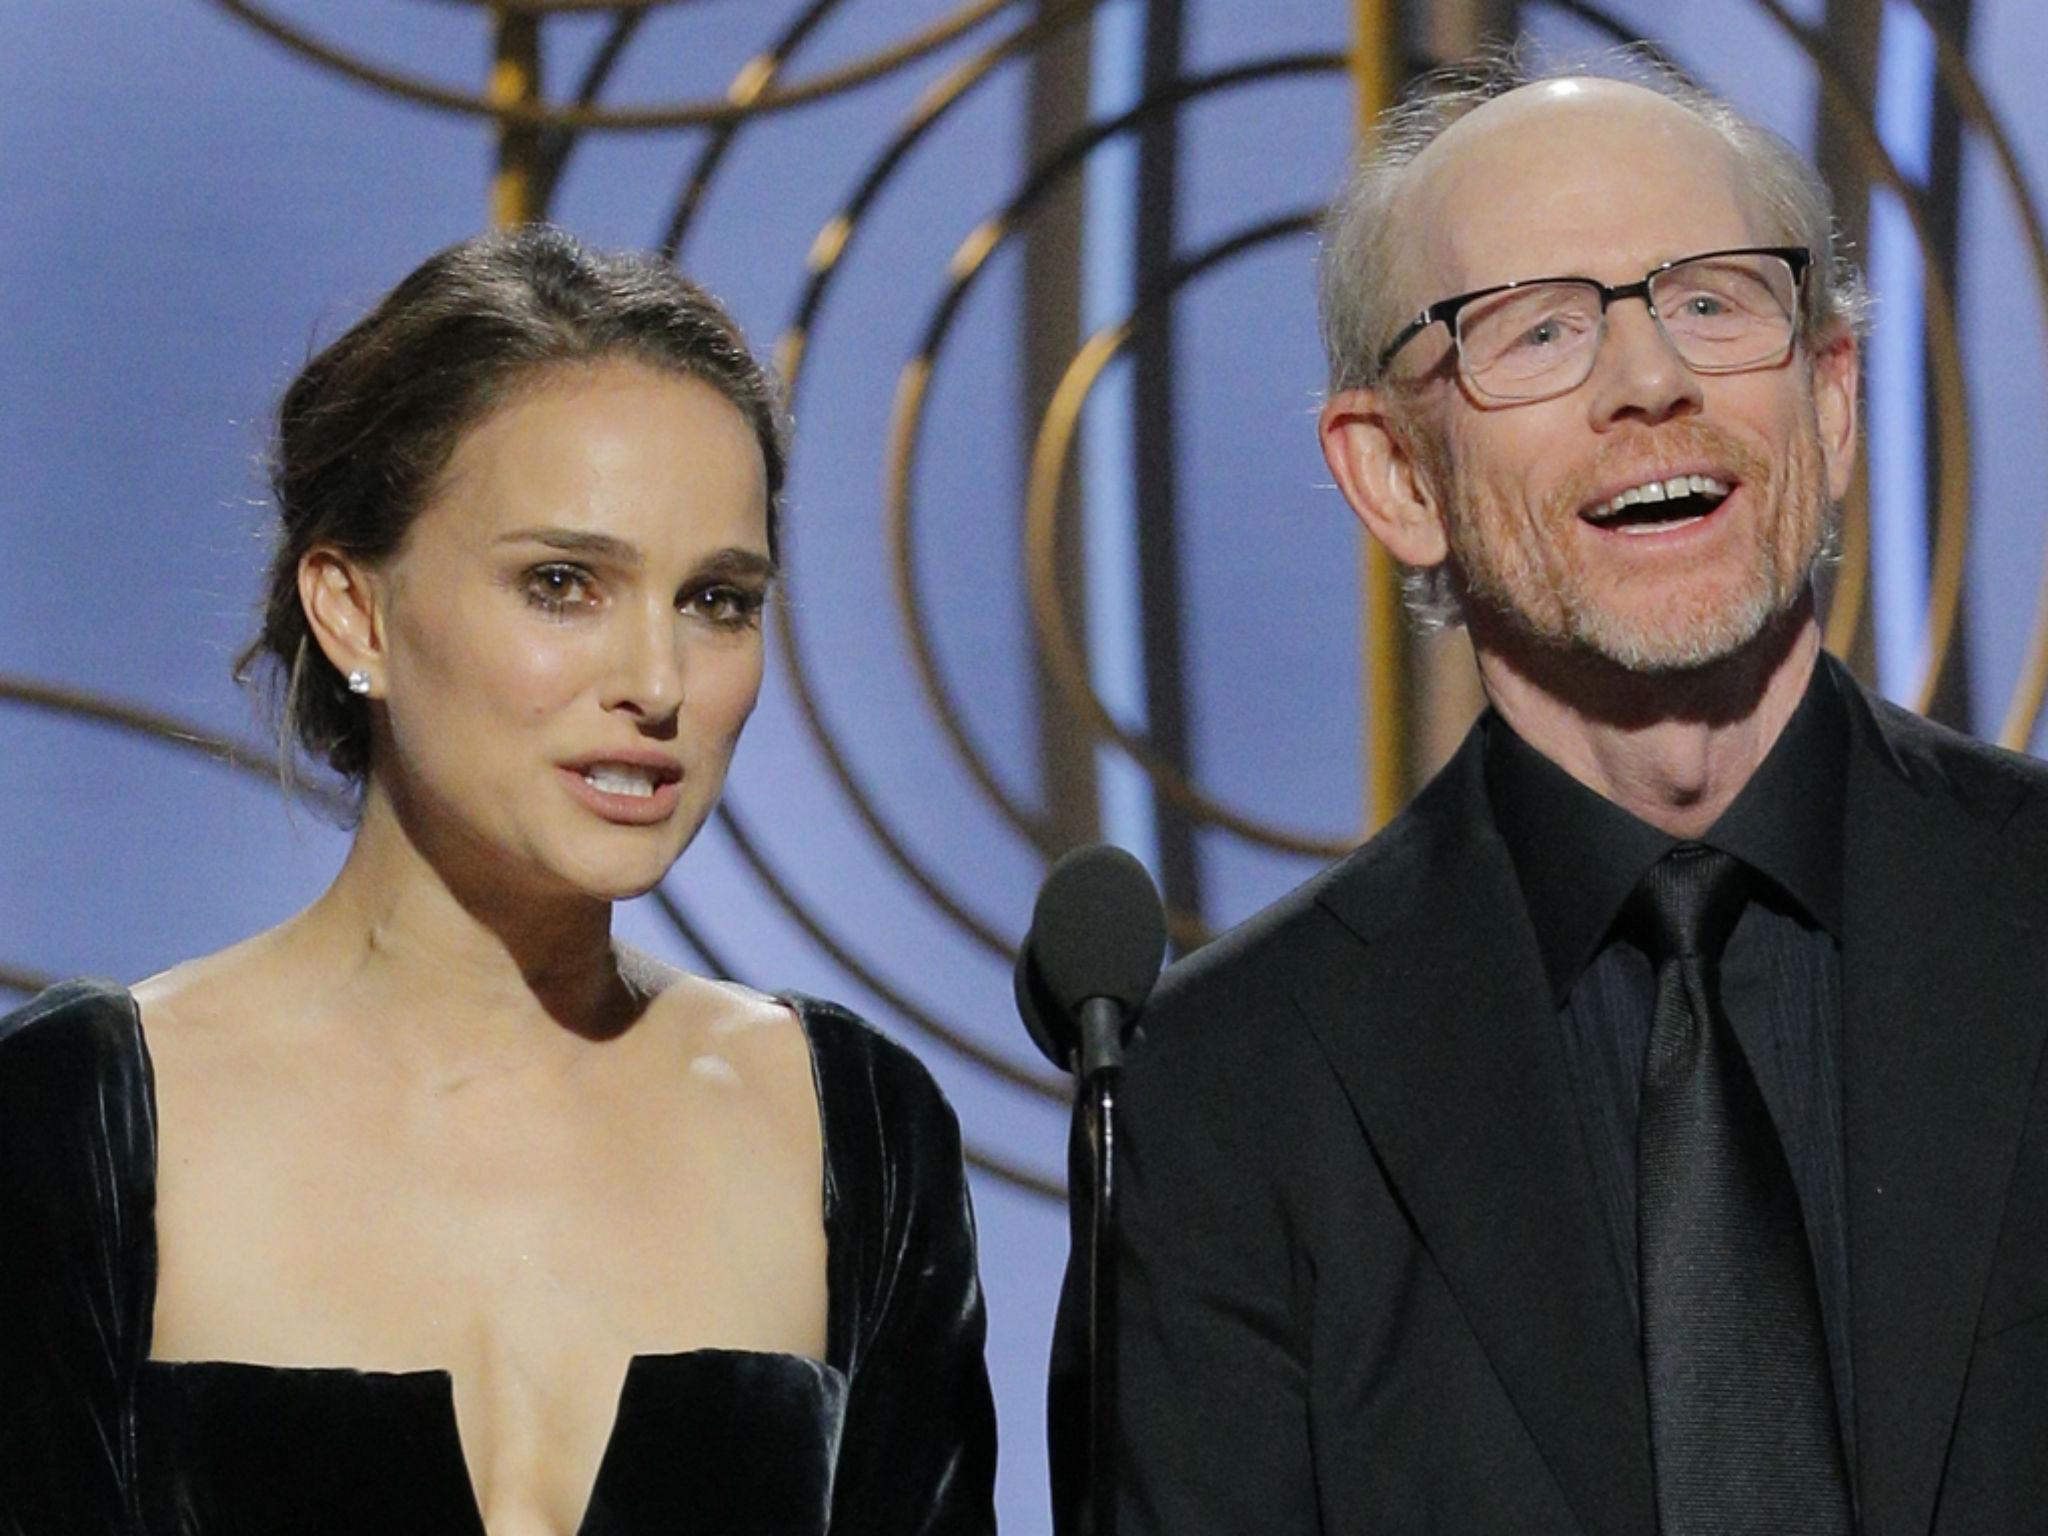 Natalie Portman Praised For Swipe At All Male Director